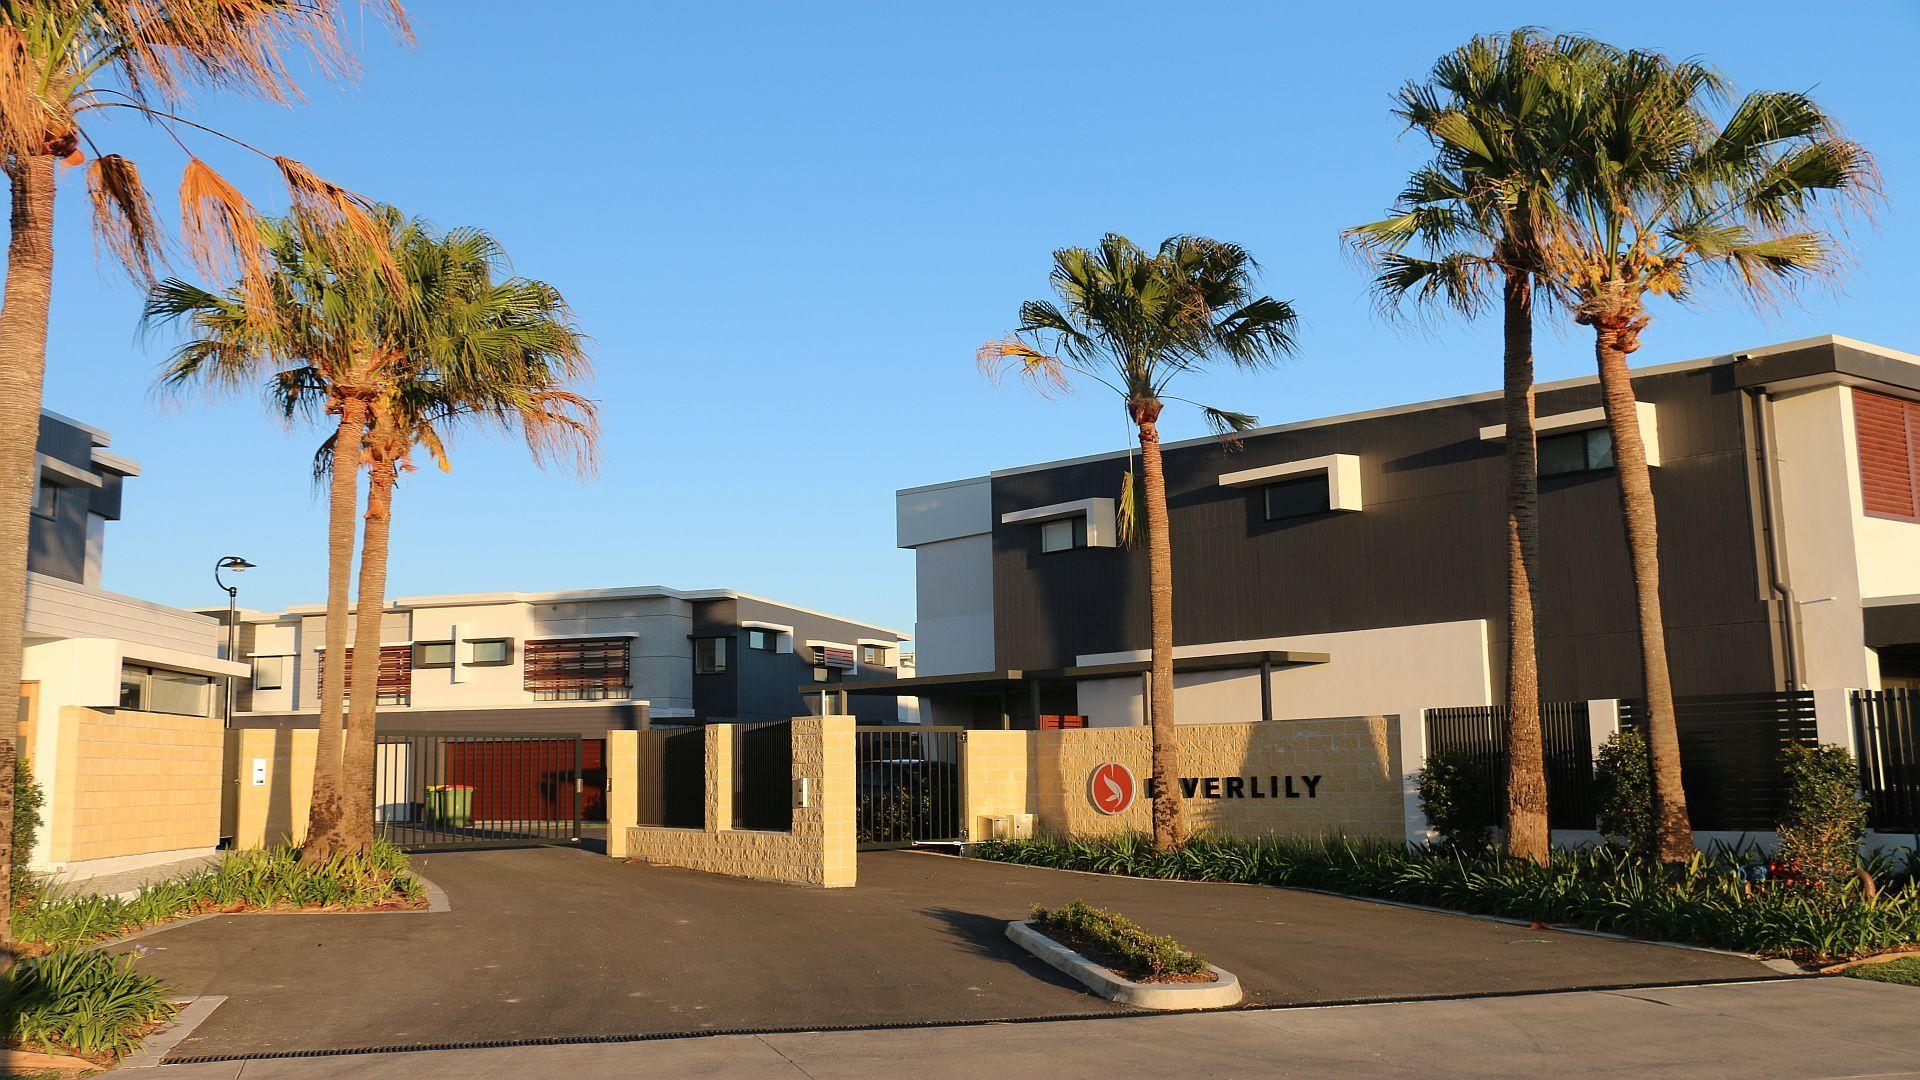 68/42 Stadium Drive, Robina QLD 4226, Image 0